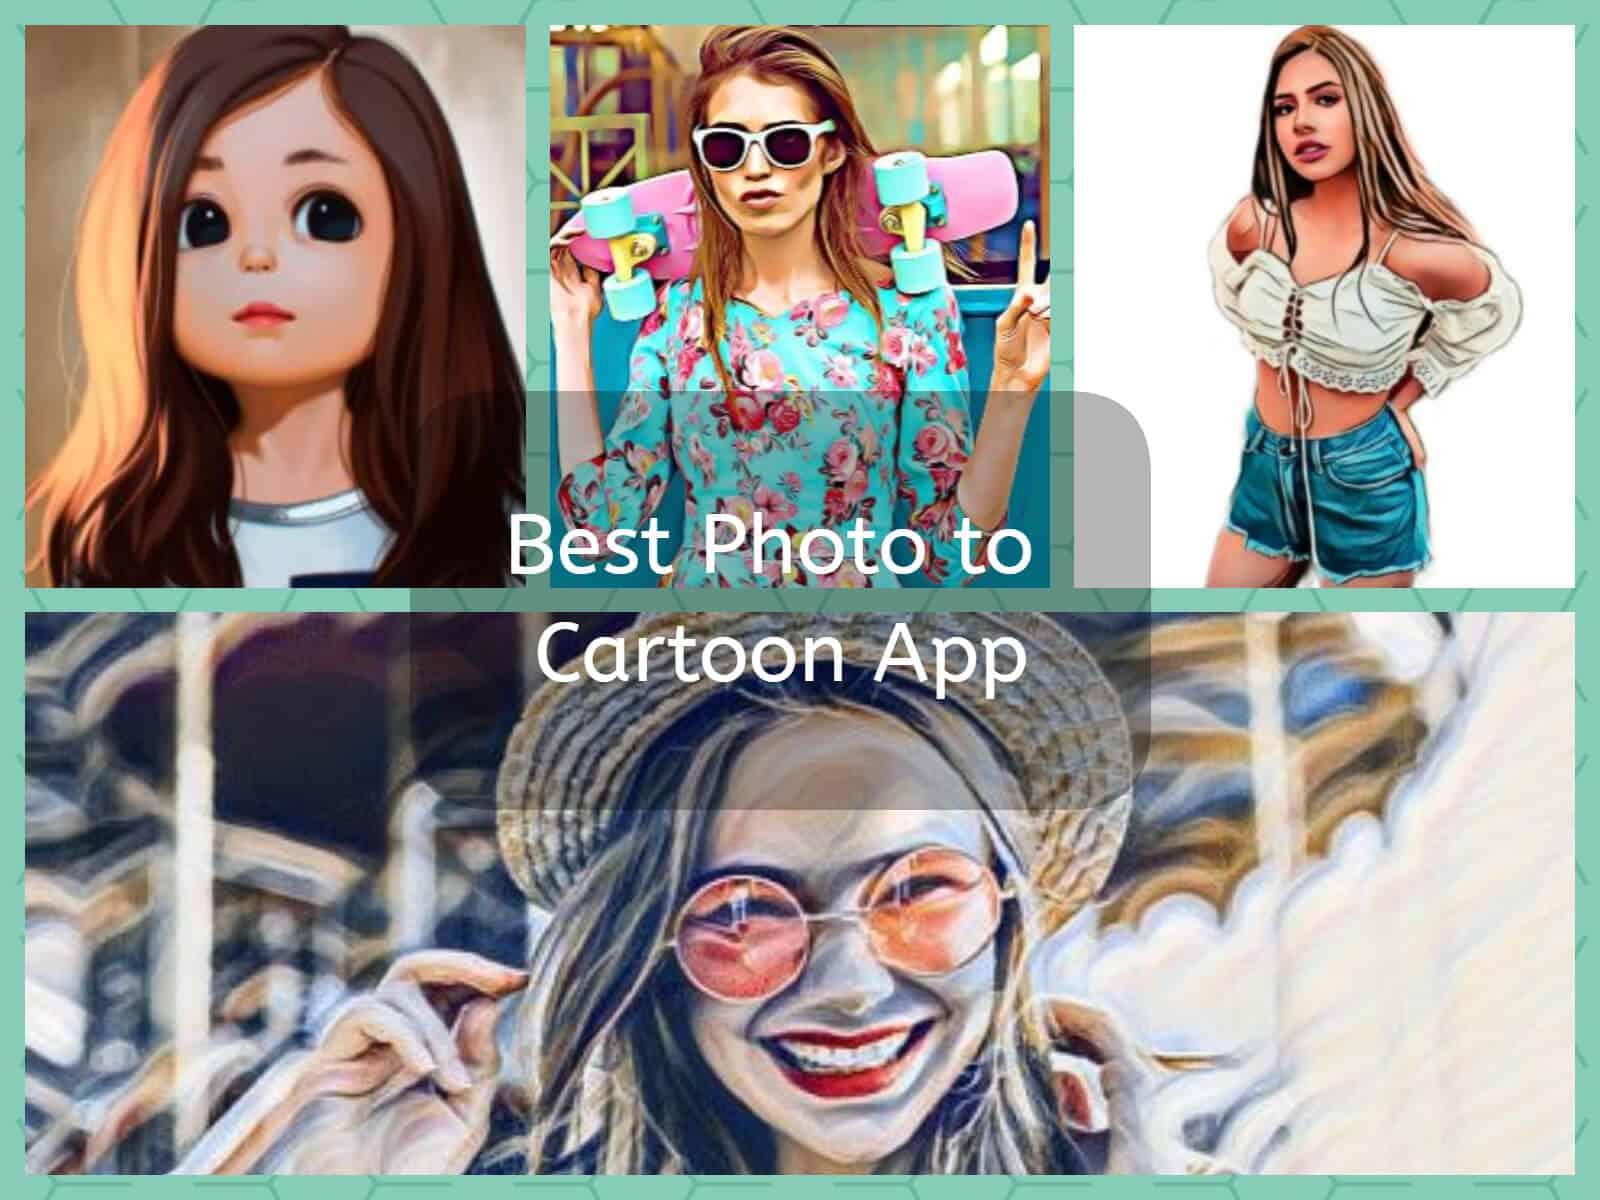 Best Photo to Cartoon Apps